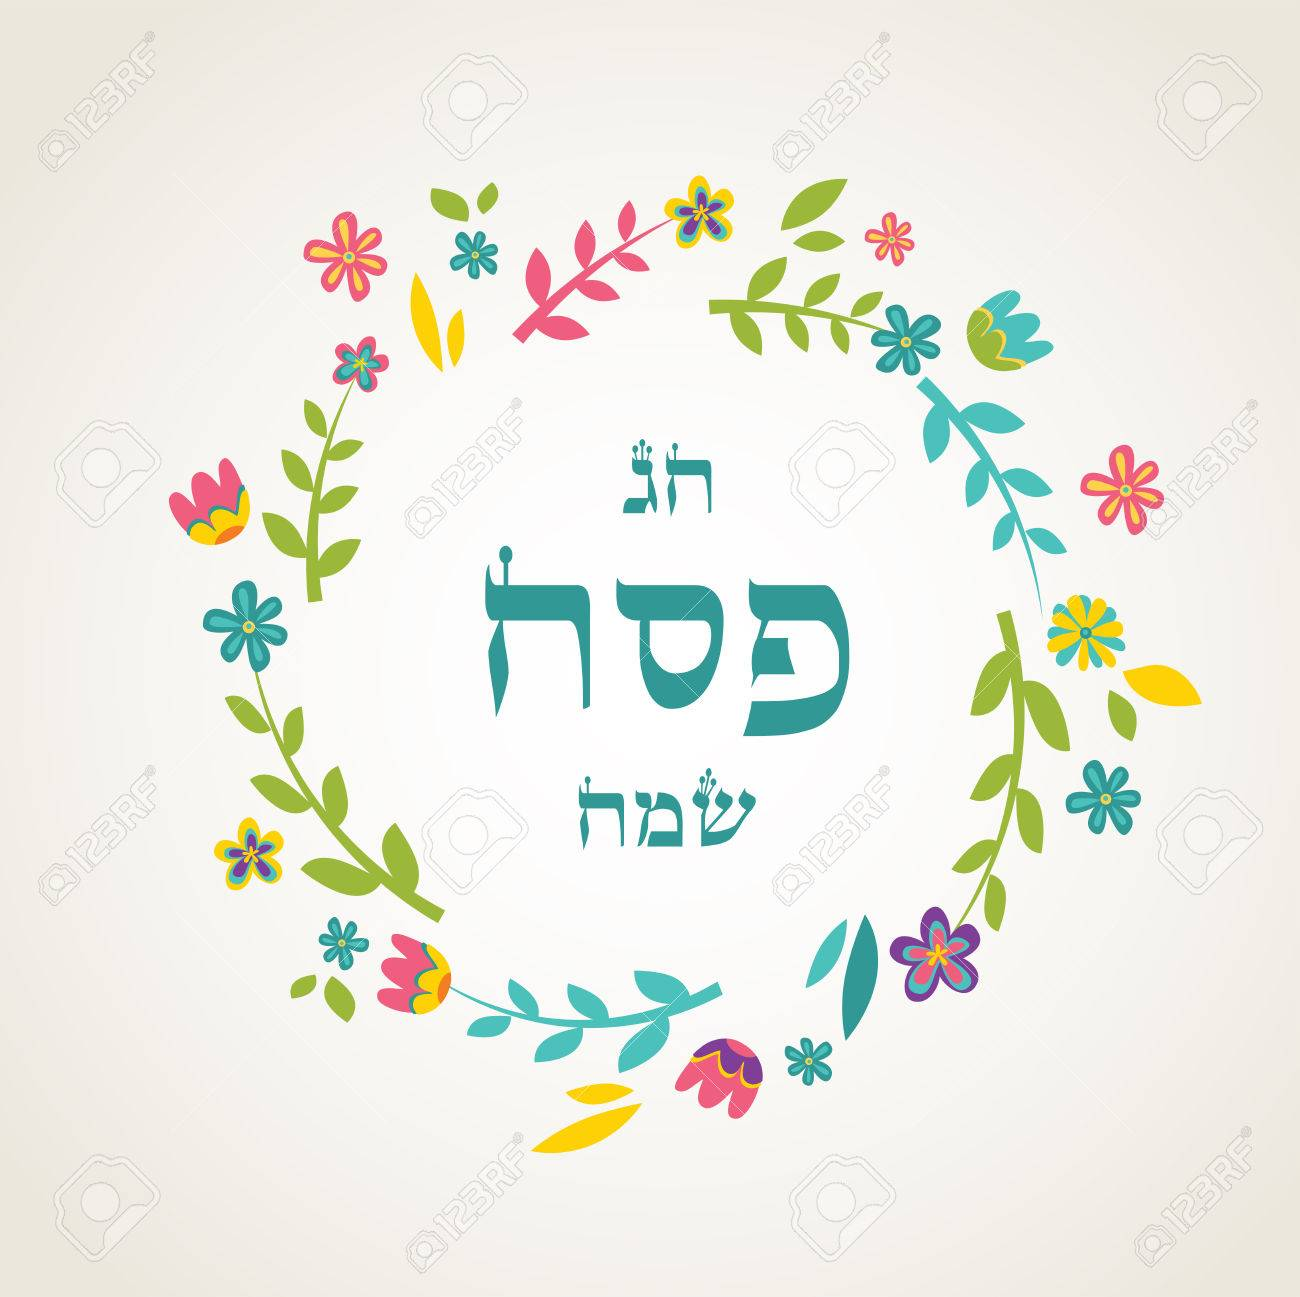 Jewish passover holiday greeting card design happy passover jewish passover holiday greeting card design happy passover in hebrew stock vector 37185465 m4hsunfo